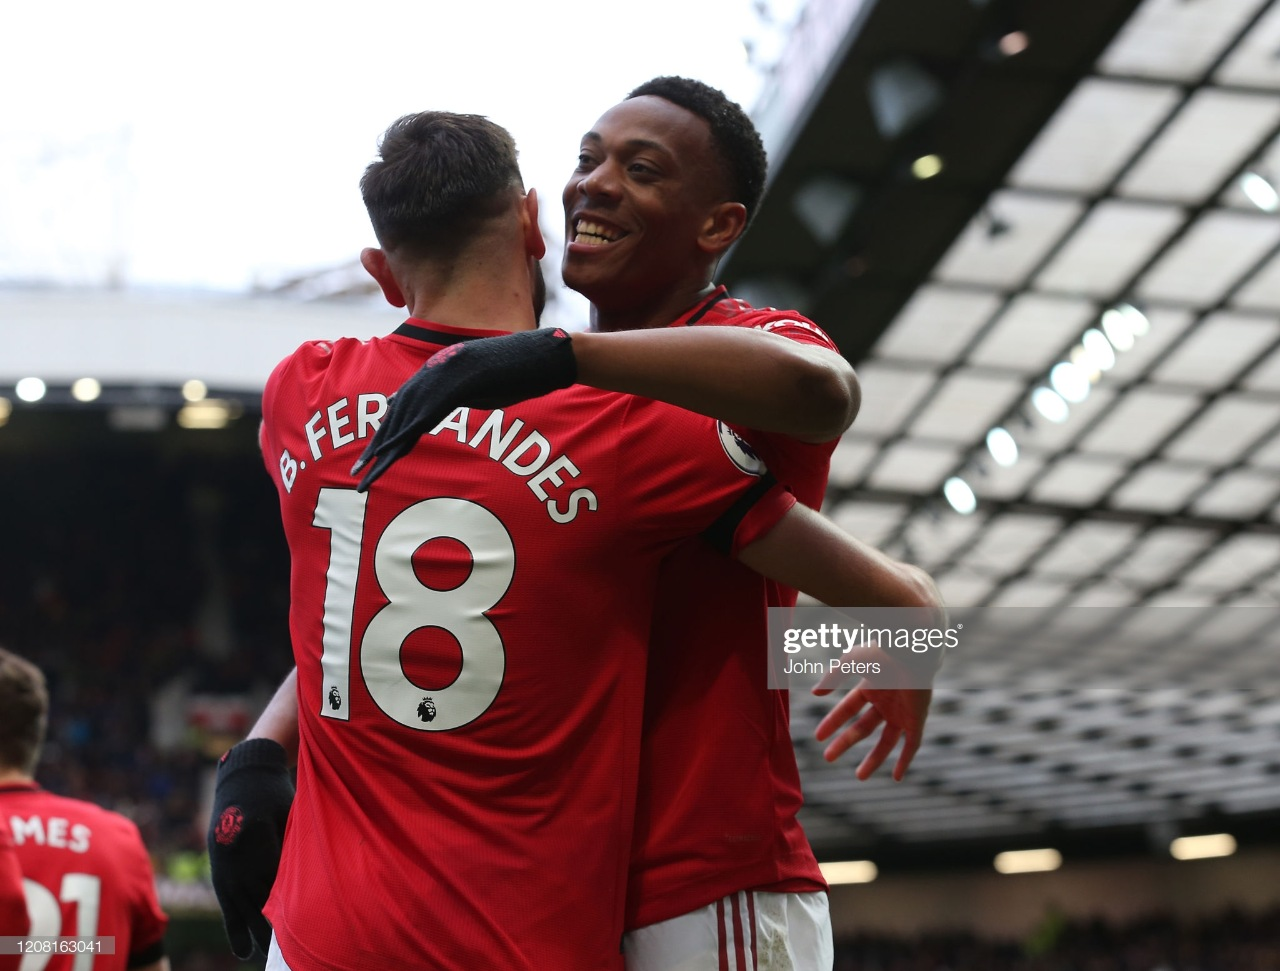 Manchester United Biography Wiki Vavel International